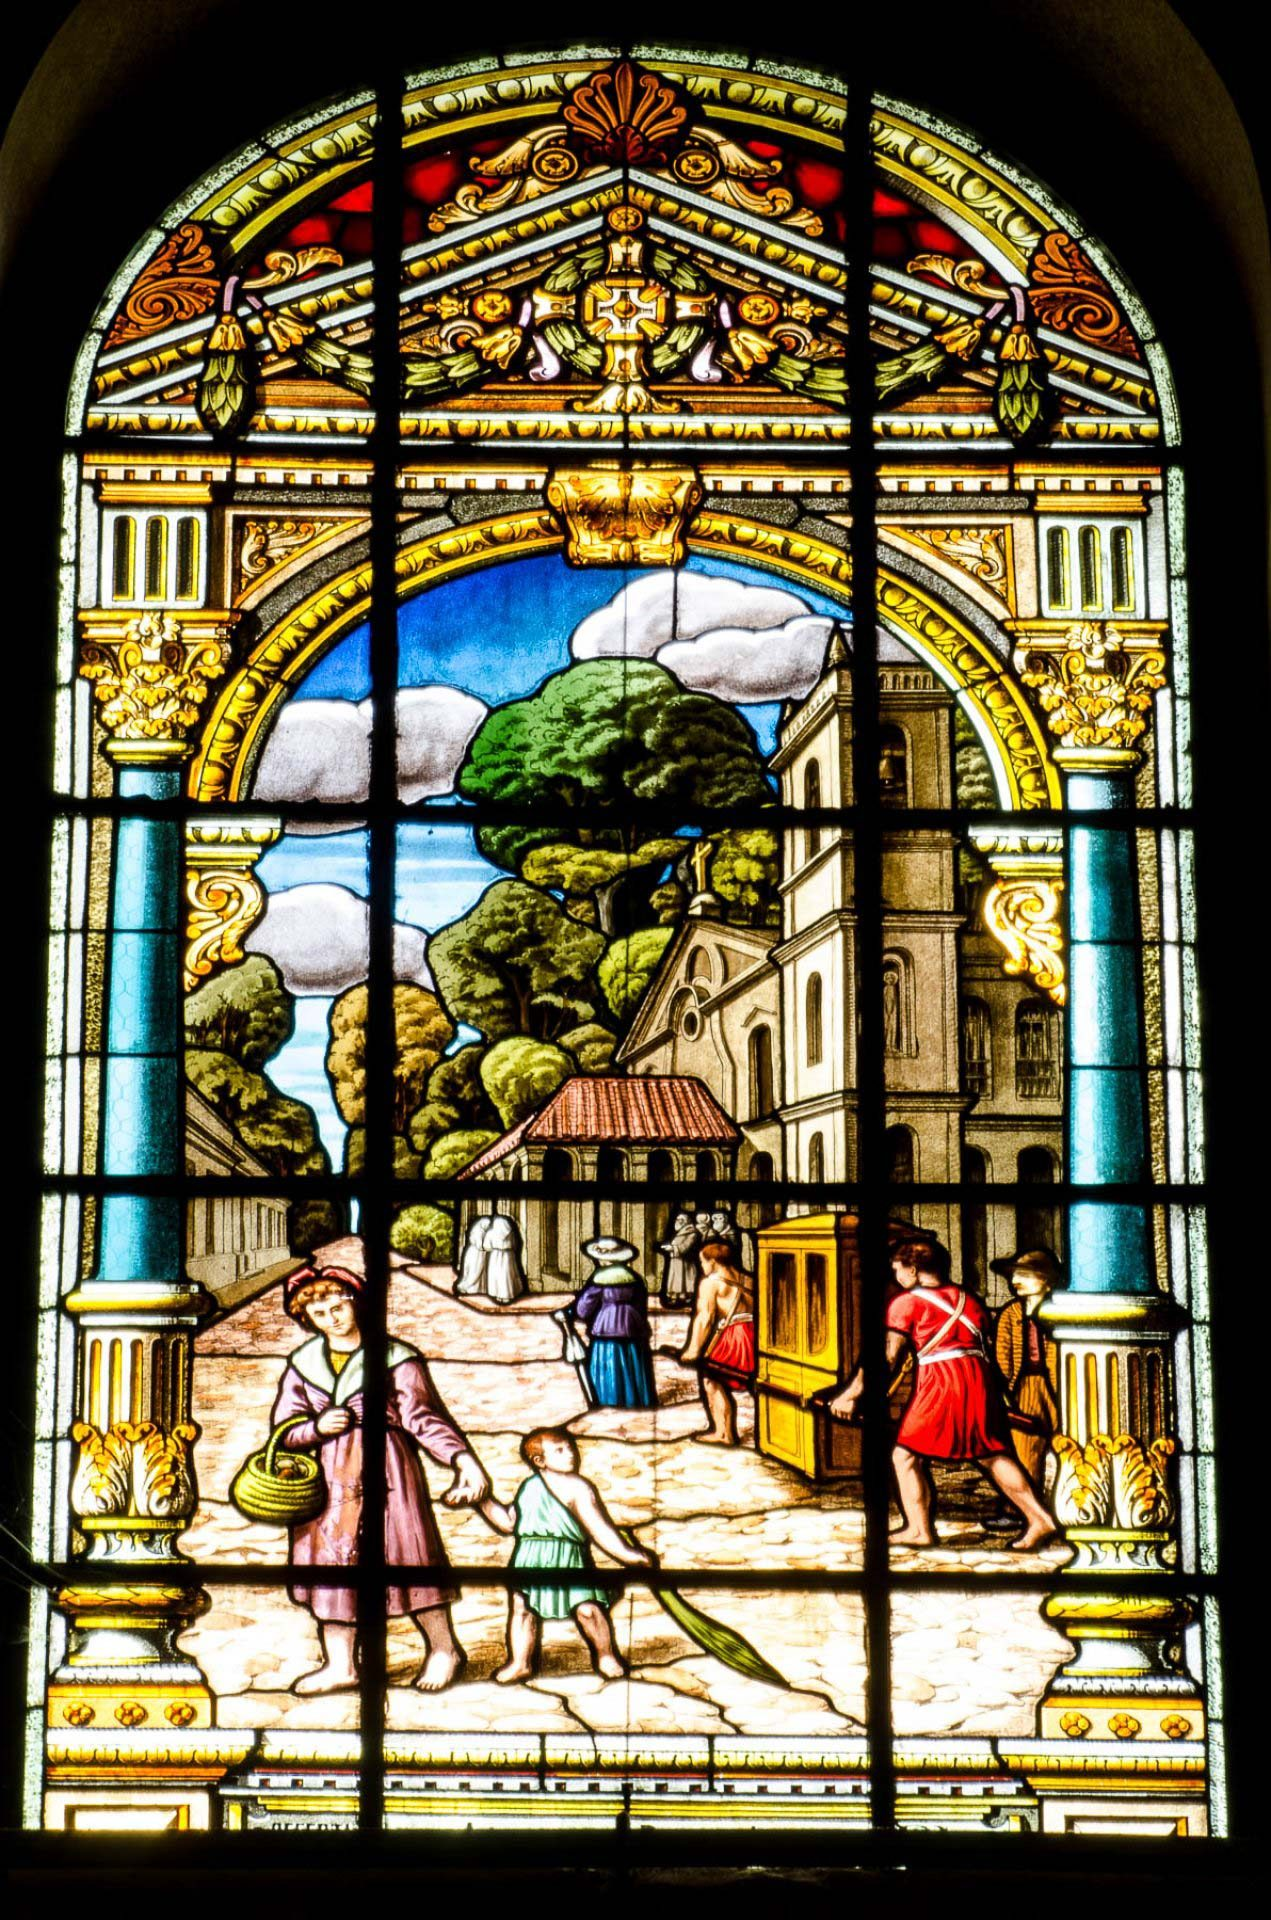 Terceira ermida de Nazaré - Vitrais da Basílica de Nazaré - B